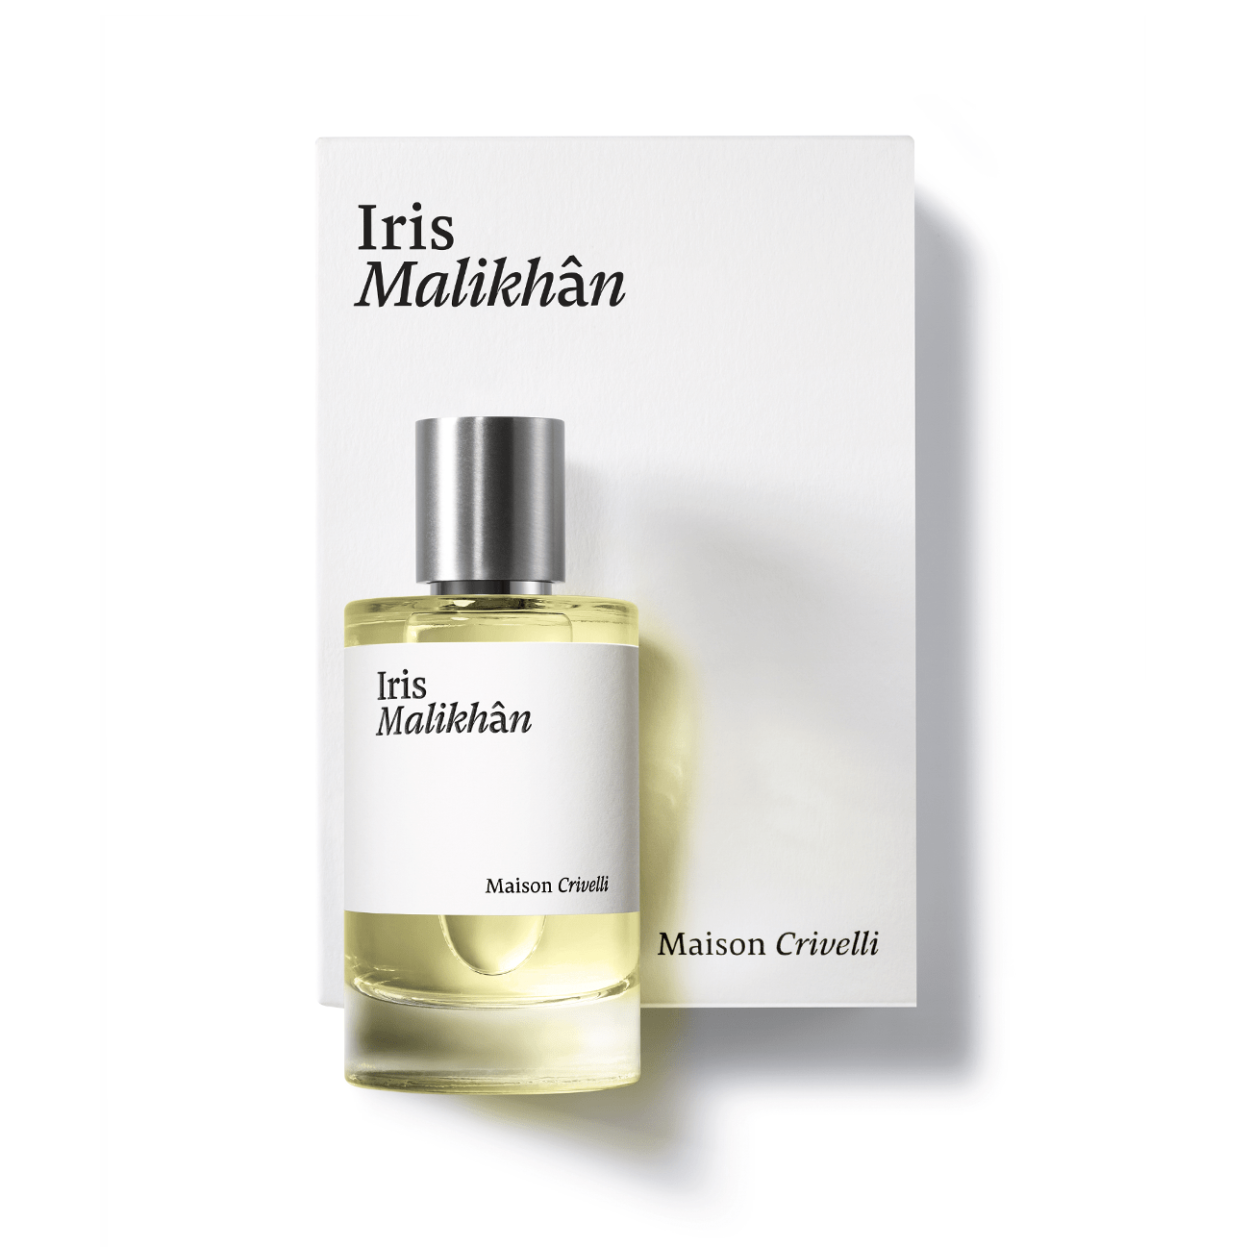 Parfum Iris Malikhan - Maison Crivelli